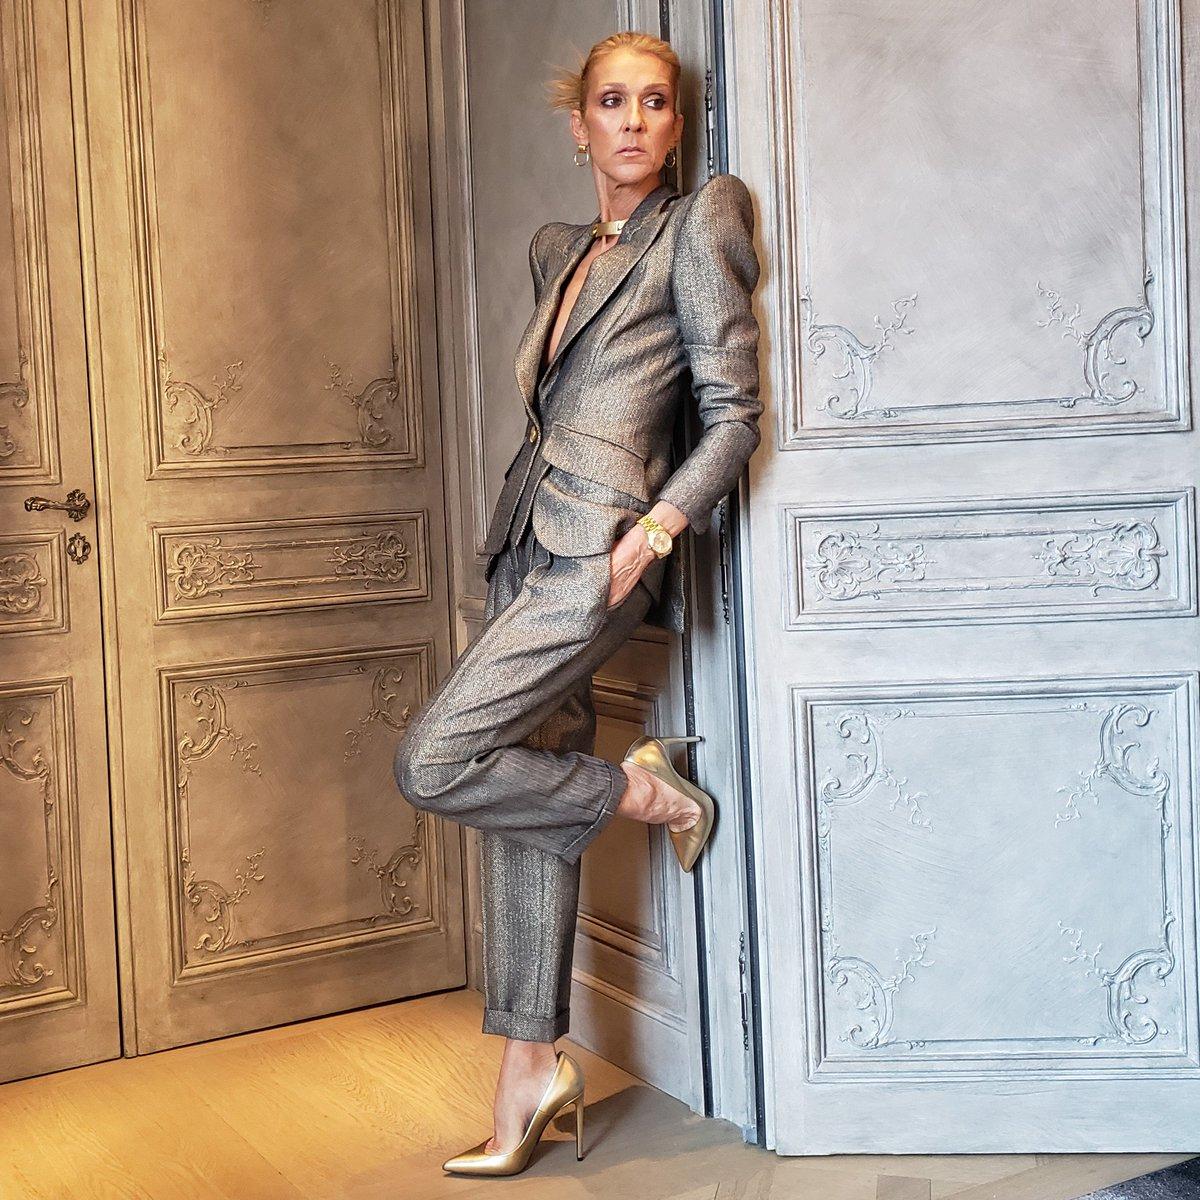 Celine Dion Rightfully Slammed Body Shamers Who Called Her Too Skinny